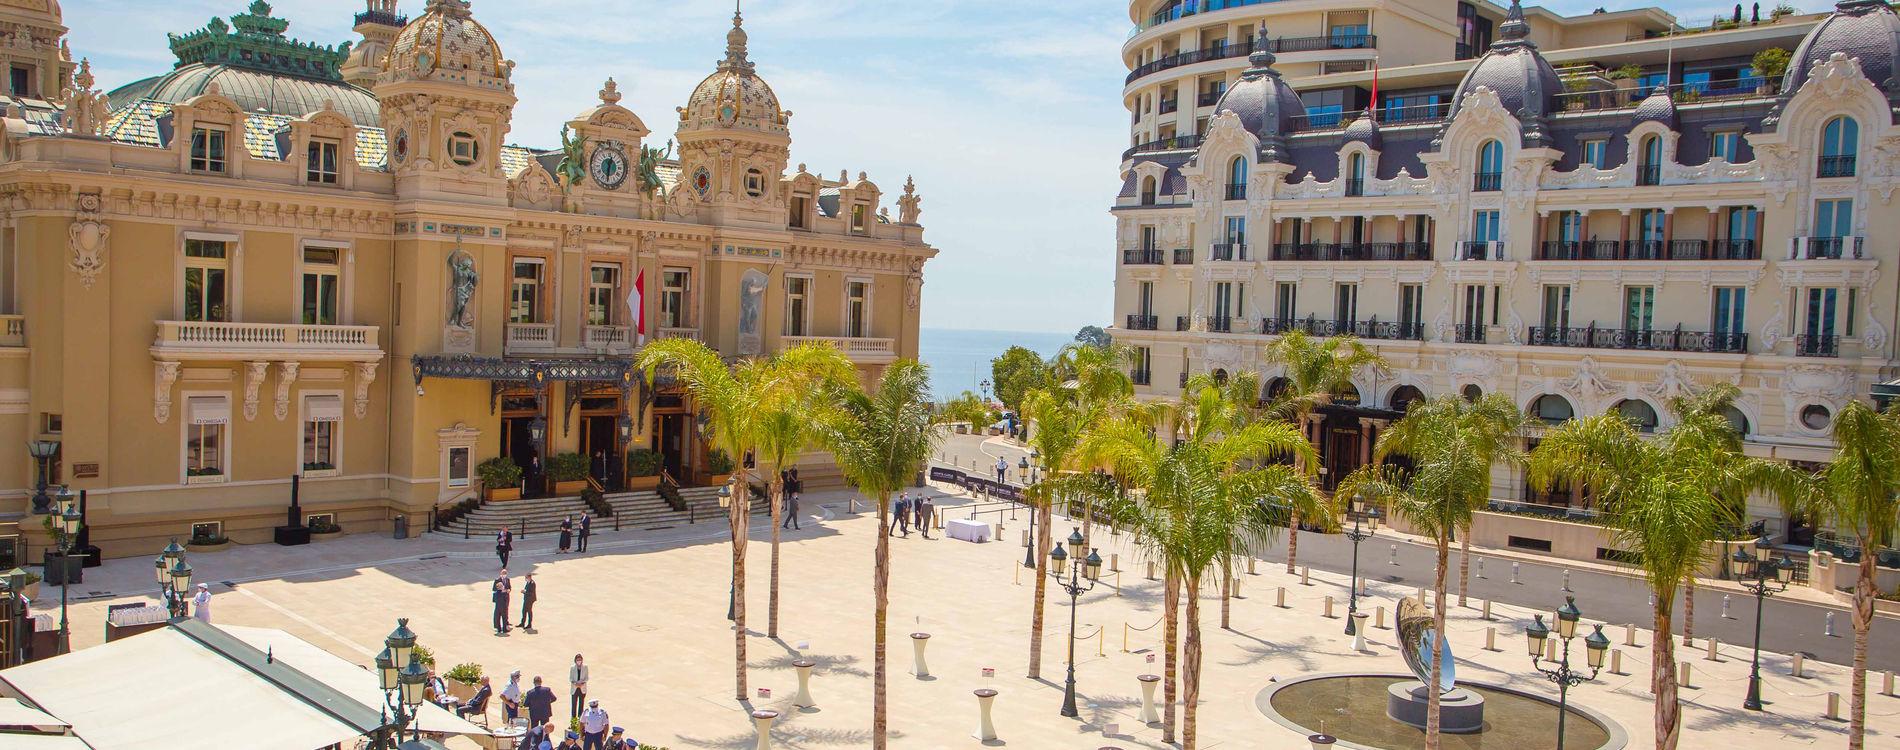 Inauguration Place du casino Monaco